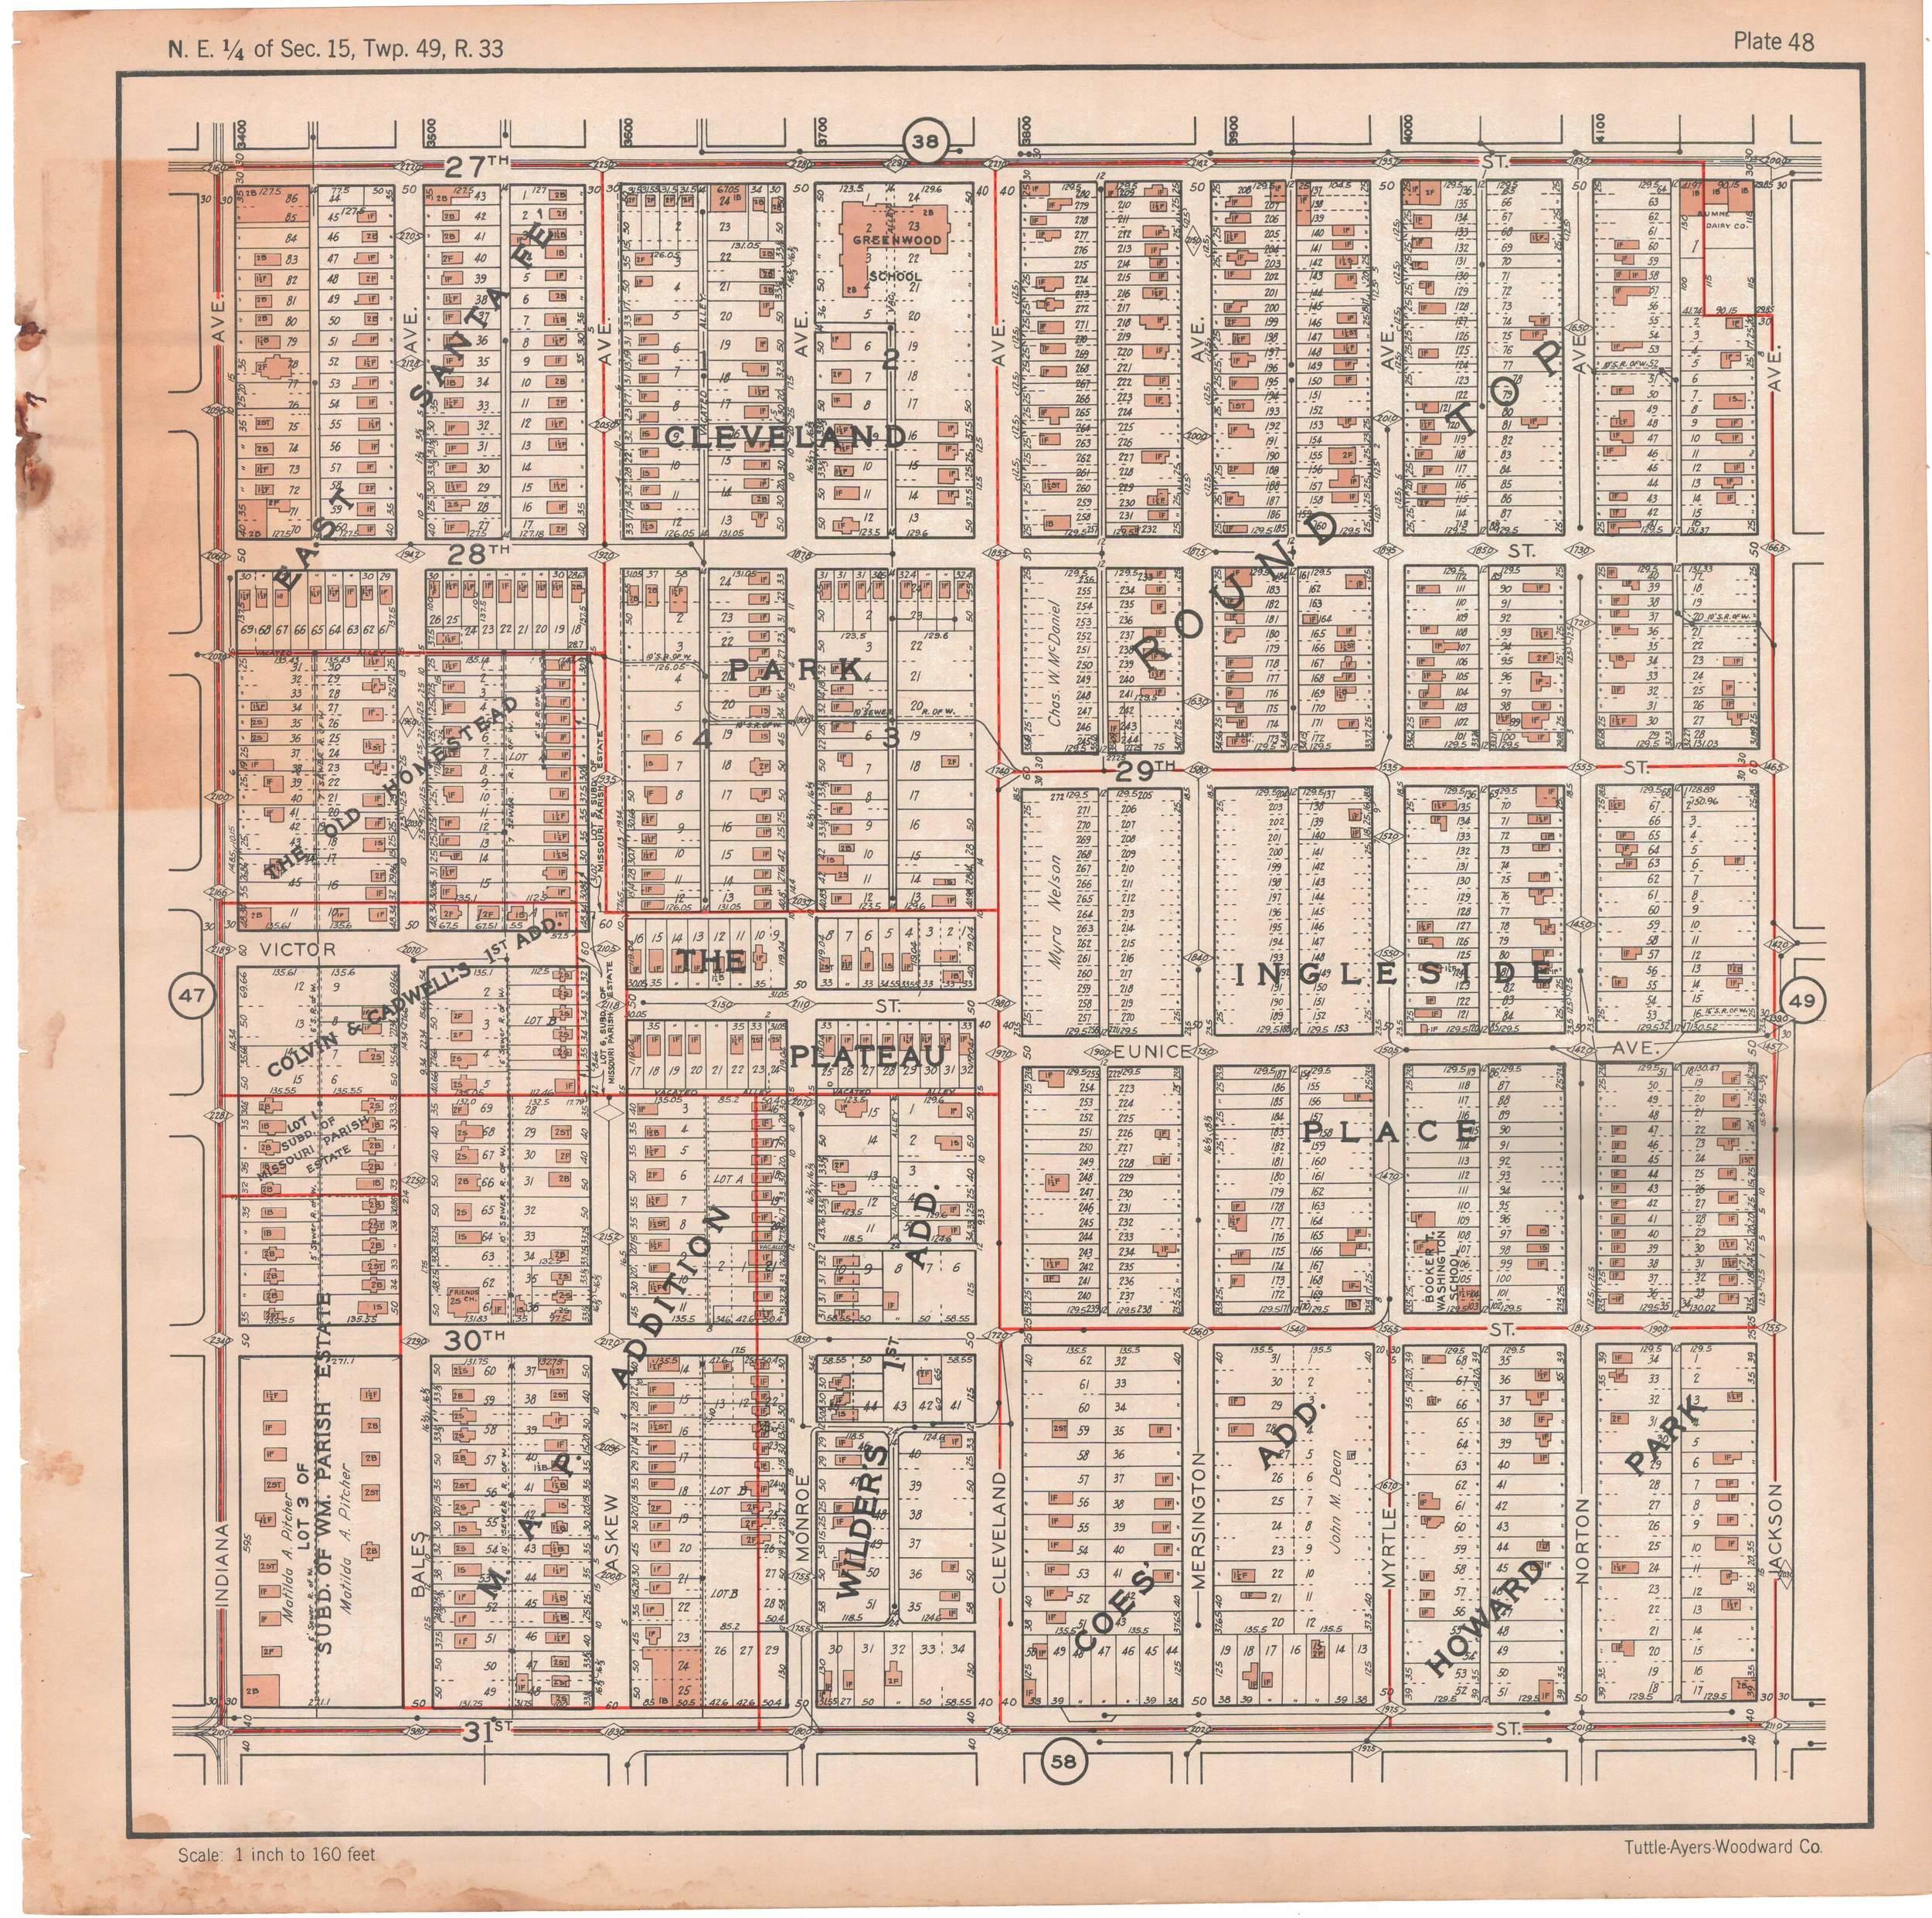 1925 TUTTLE_AYERS_Plate 48.JPG